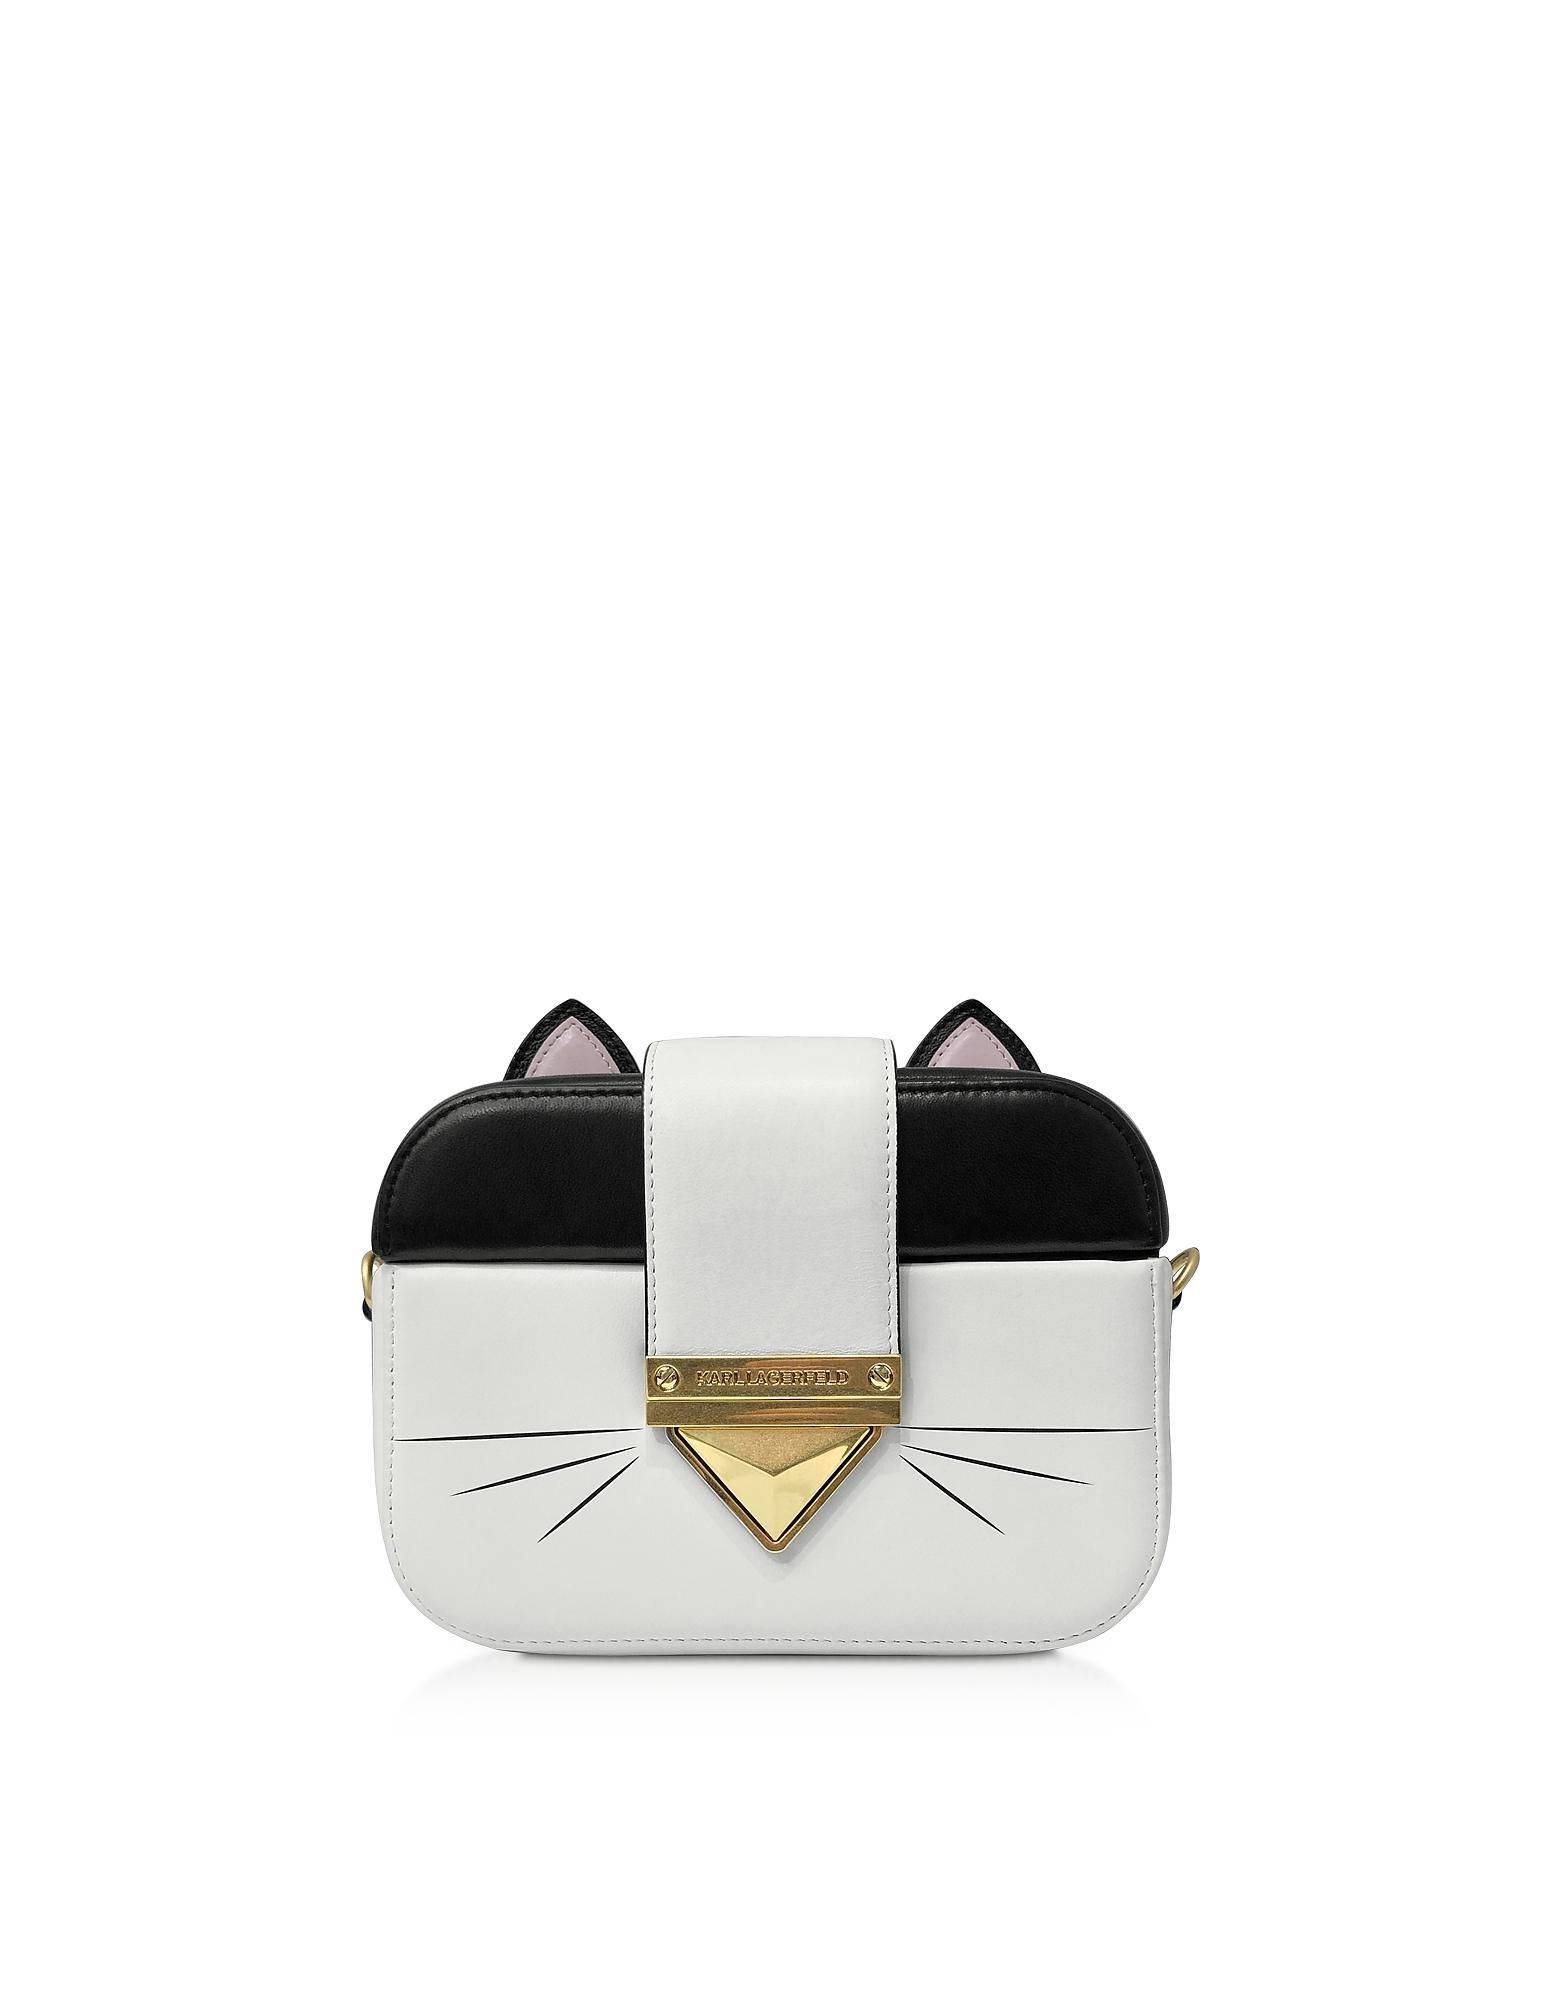 Karl Lagerfeld  Handbags Choupette Minaudi�re Bag